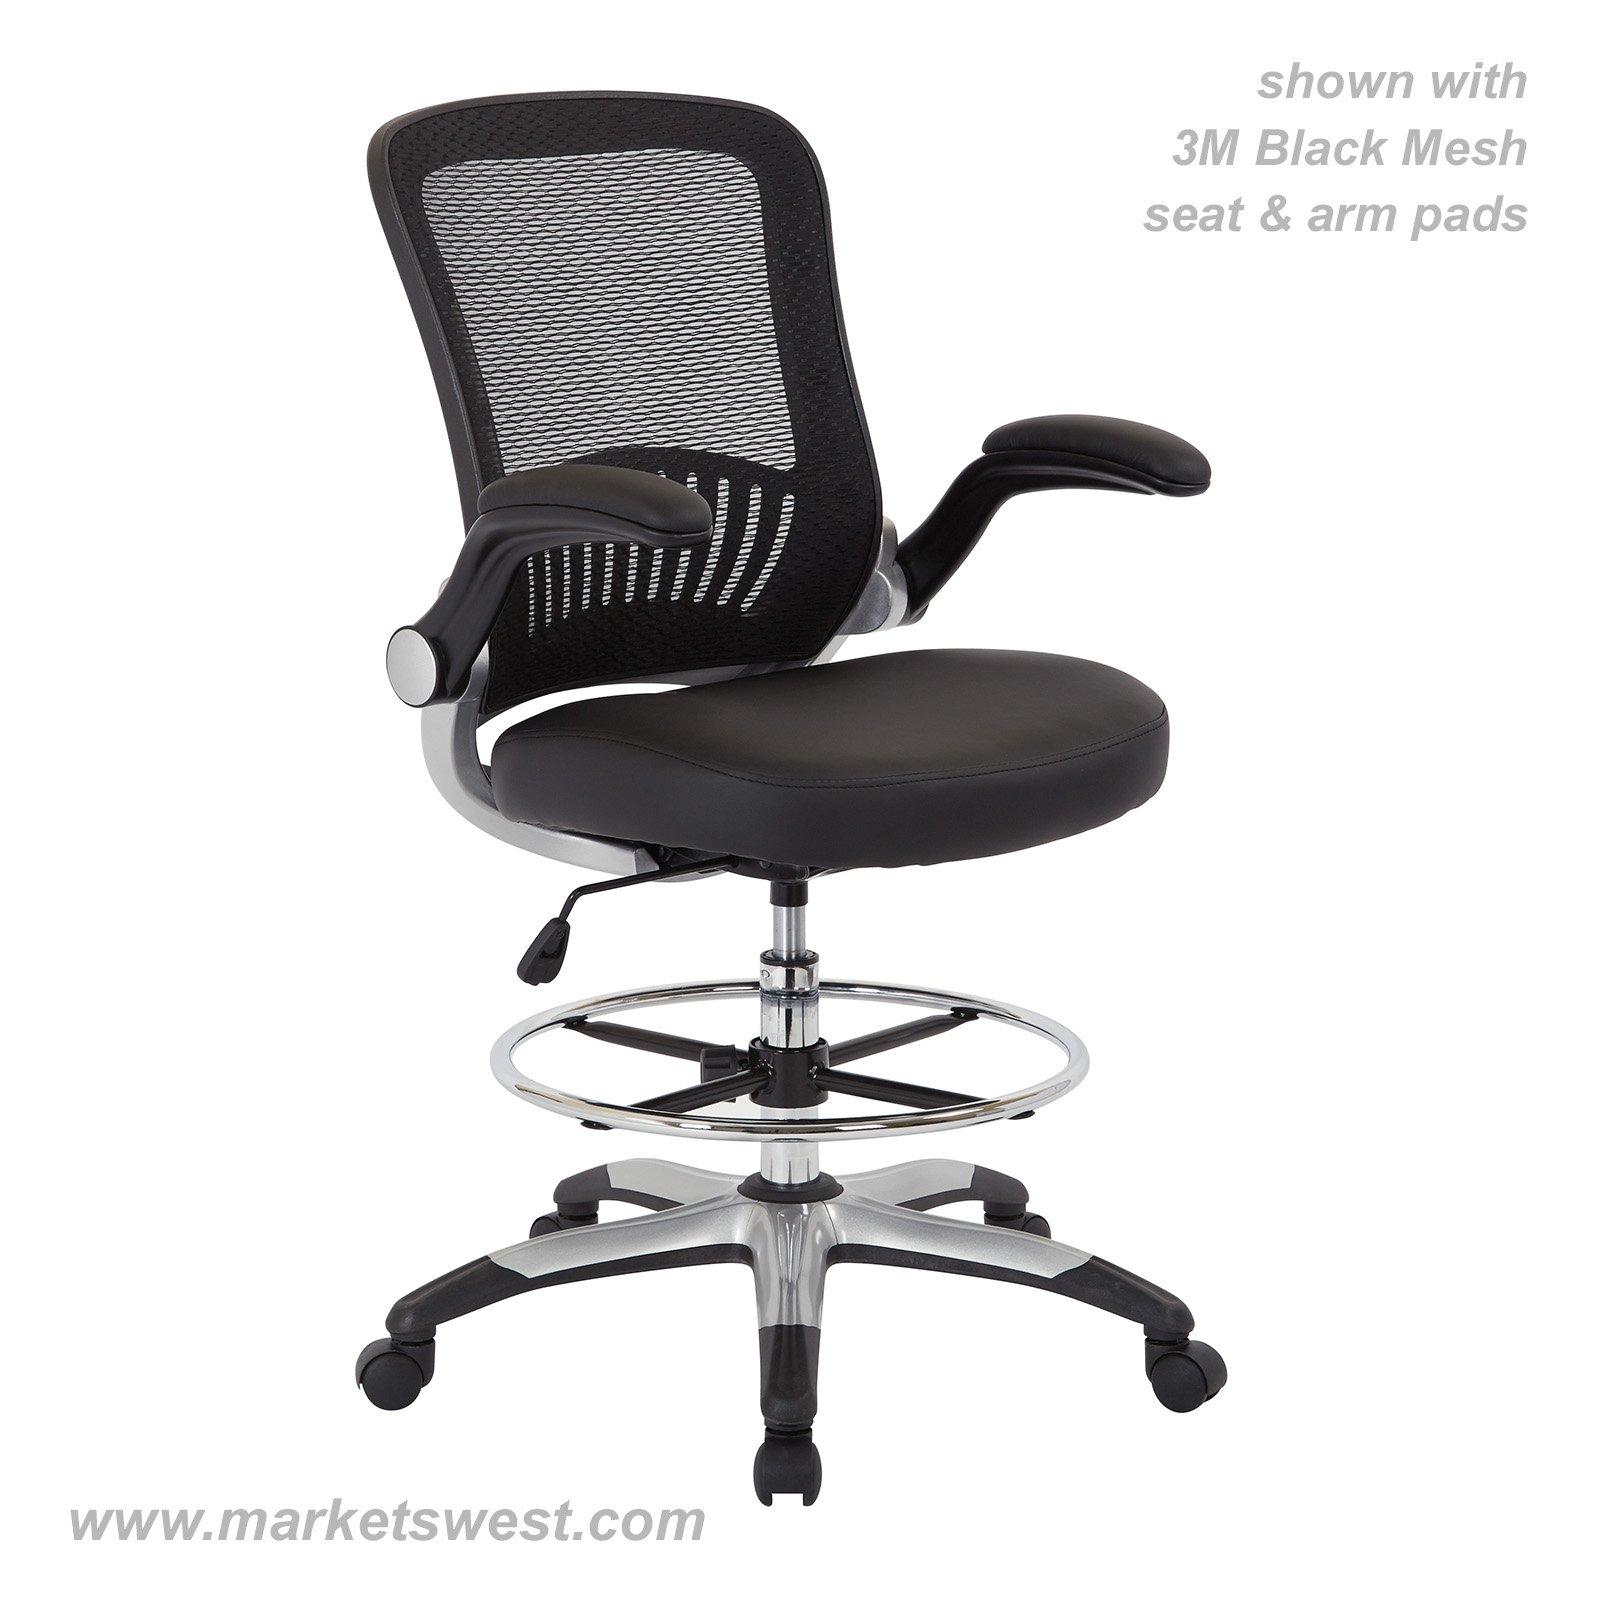 Markets West Office Furniture